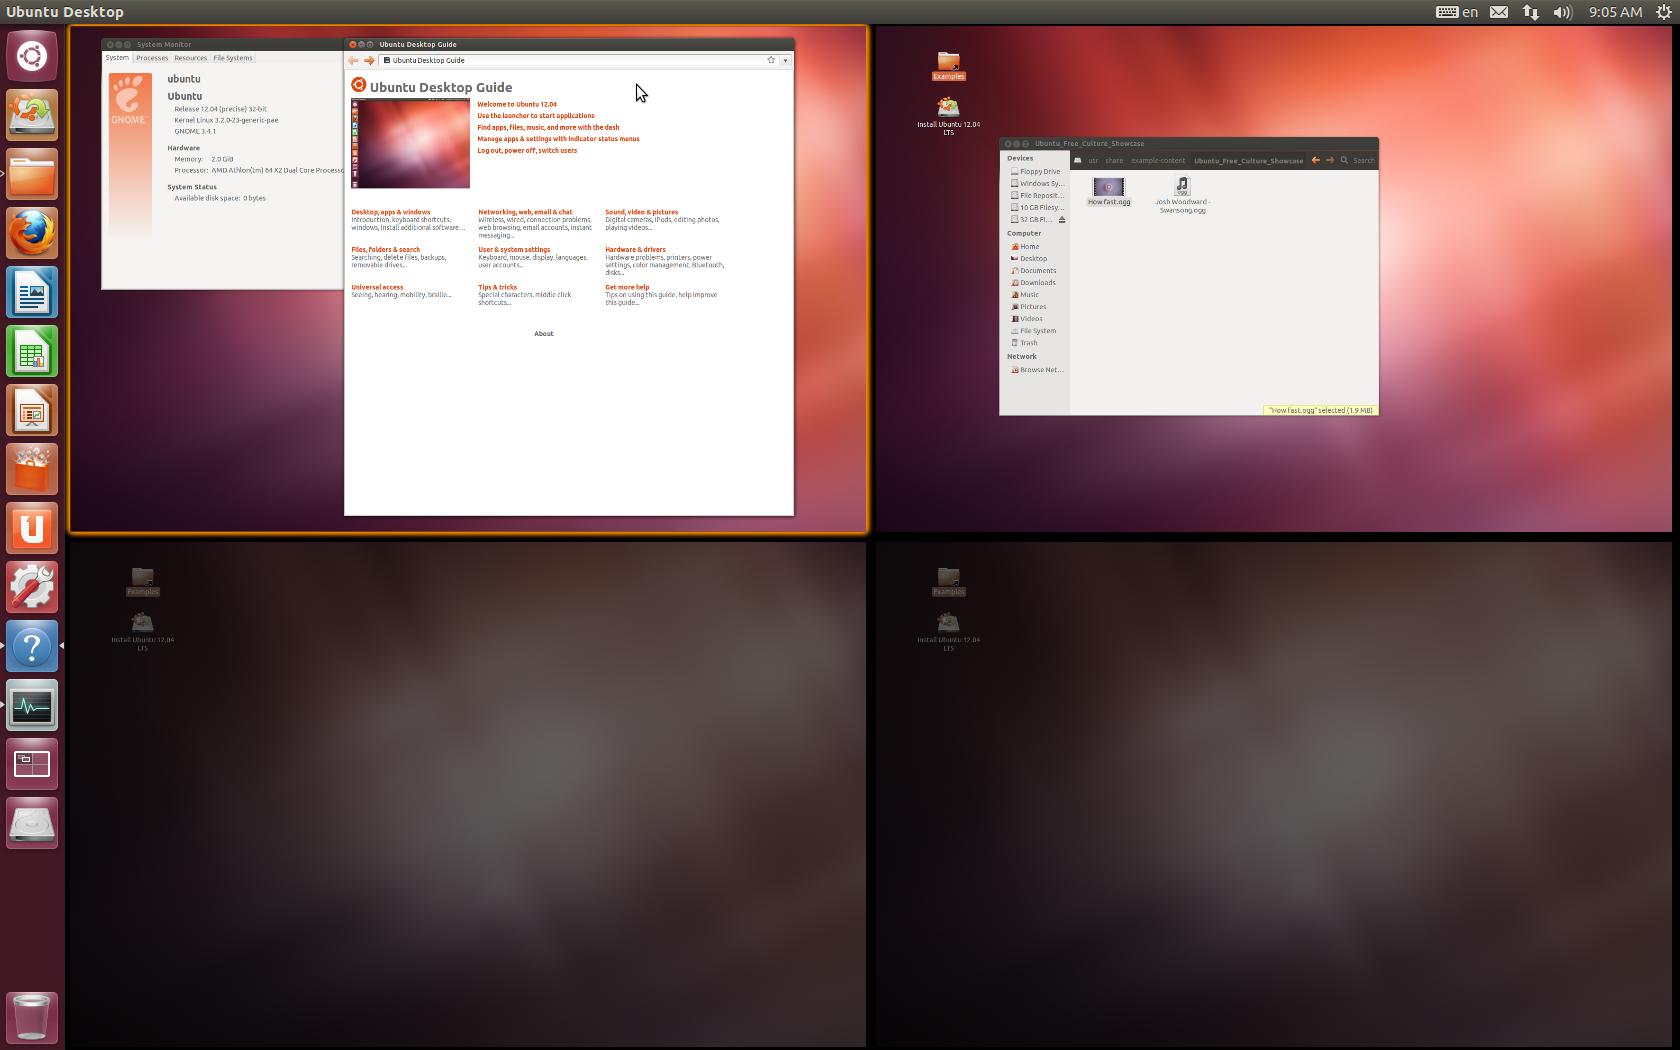 ubuntu 12.10 workspace